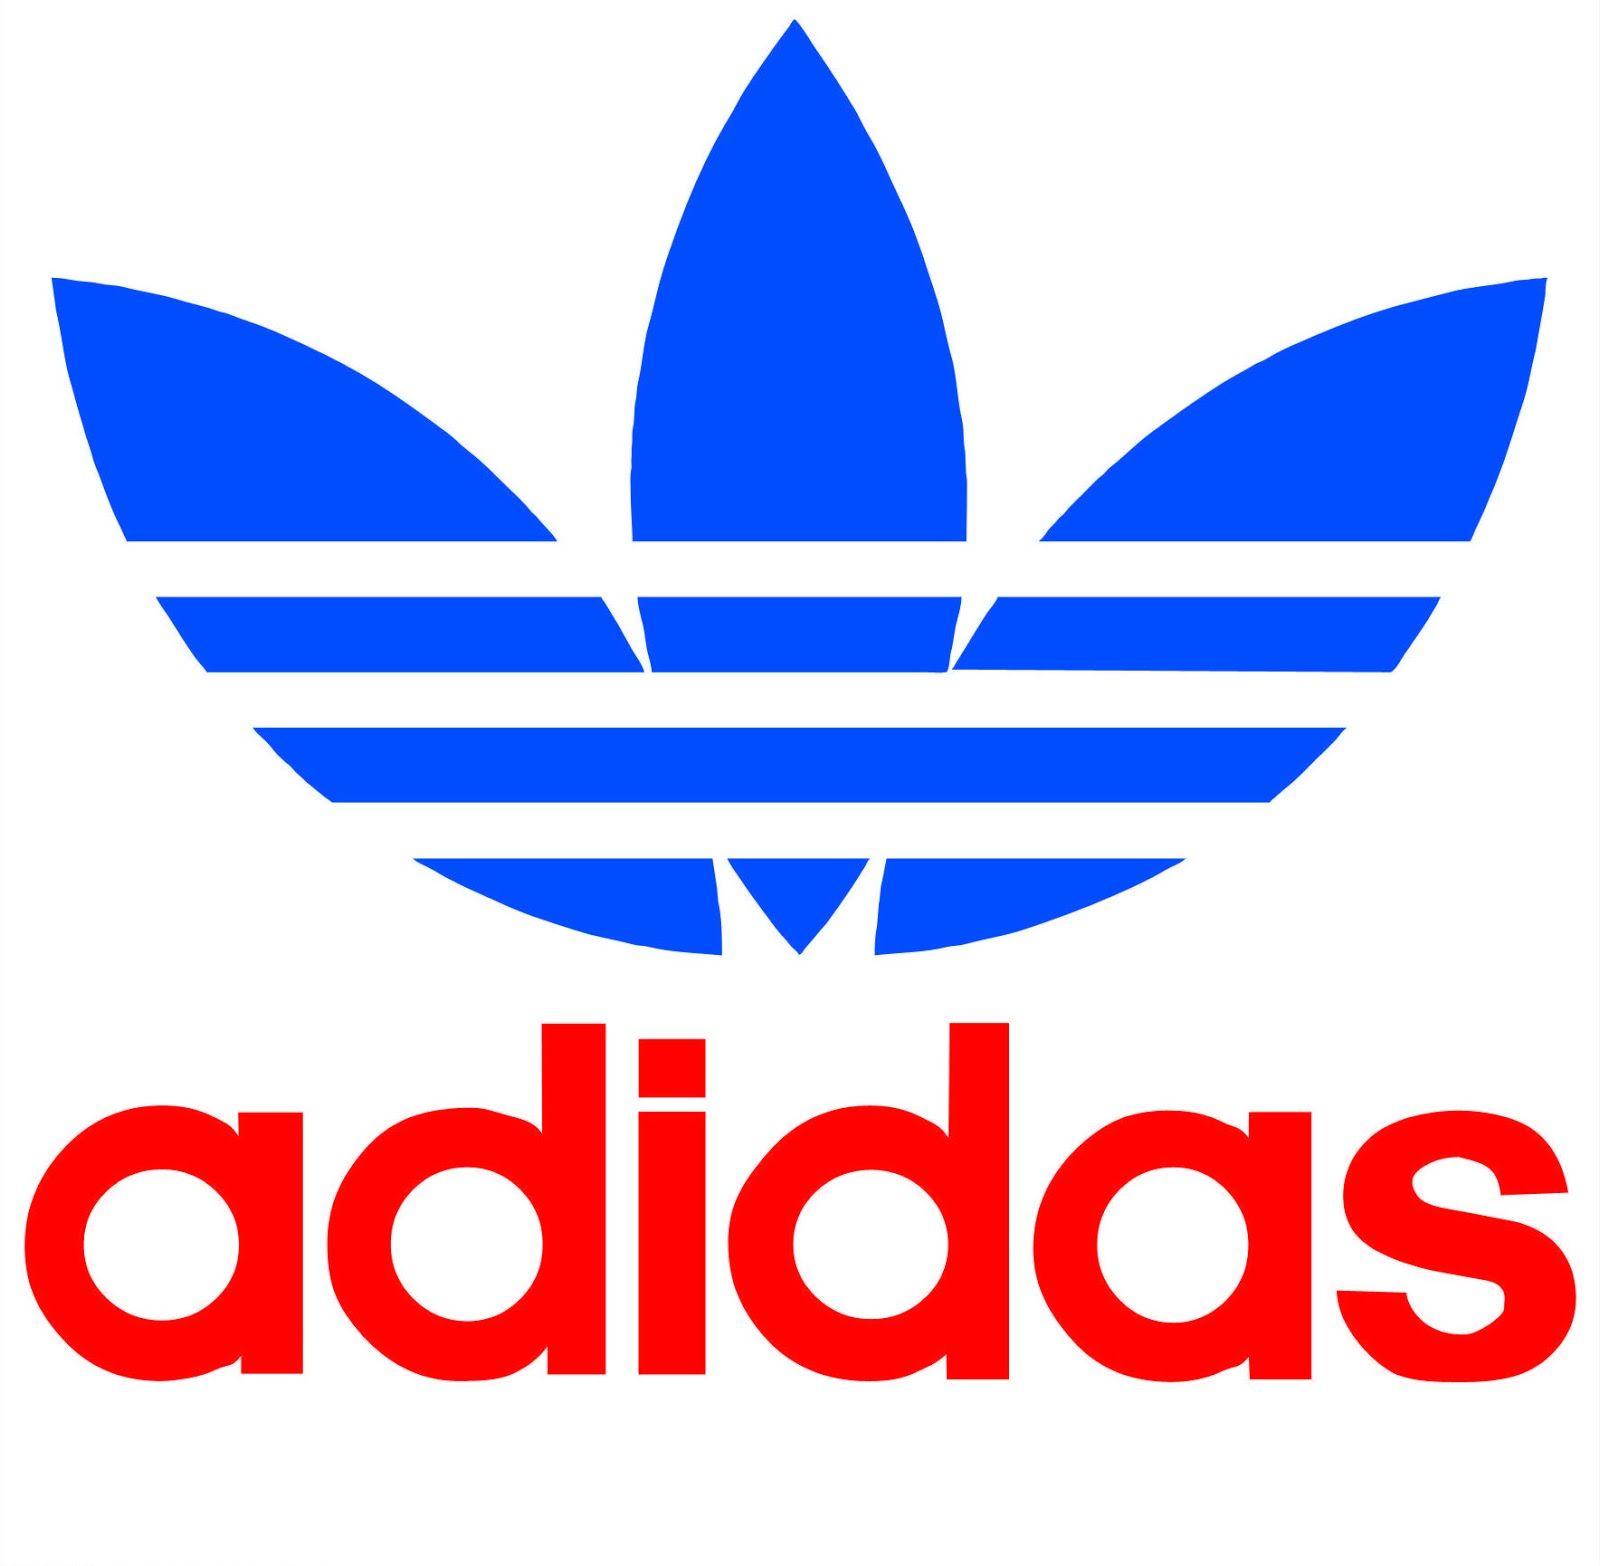 Cool Adidas Logos Animated Logo Video Tools at www.assuredprofits ...